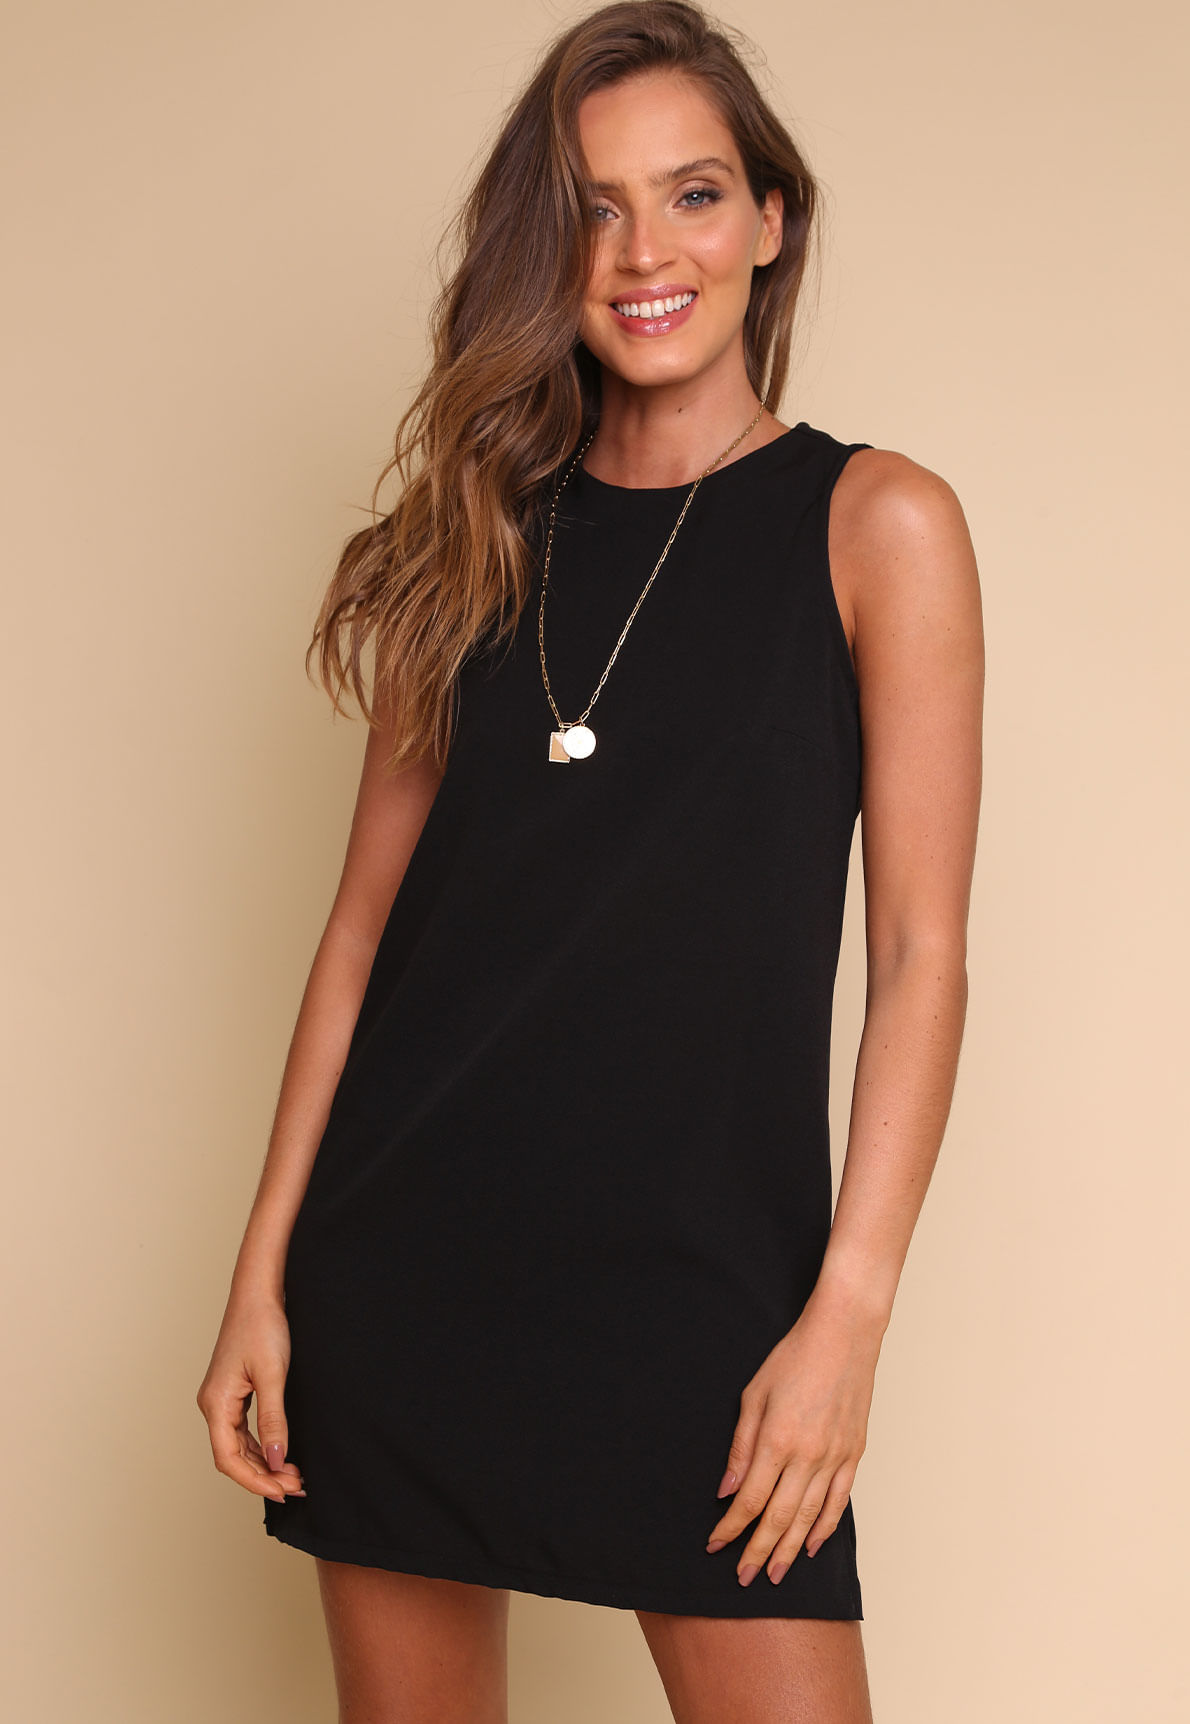 25412-vestido-alfaiataria-preto-gabriela-mundo-lolita-06